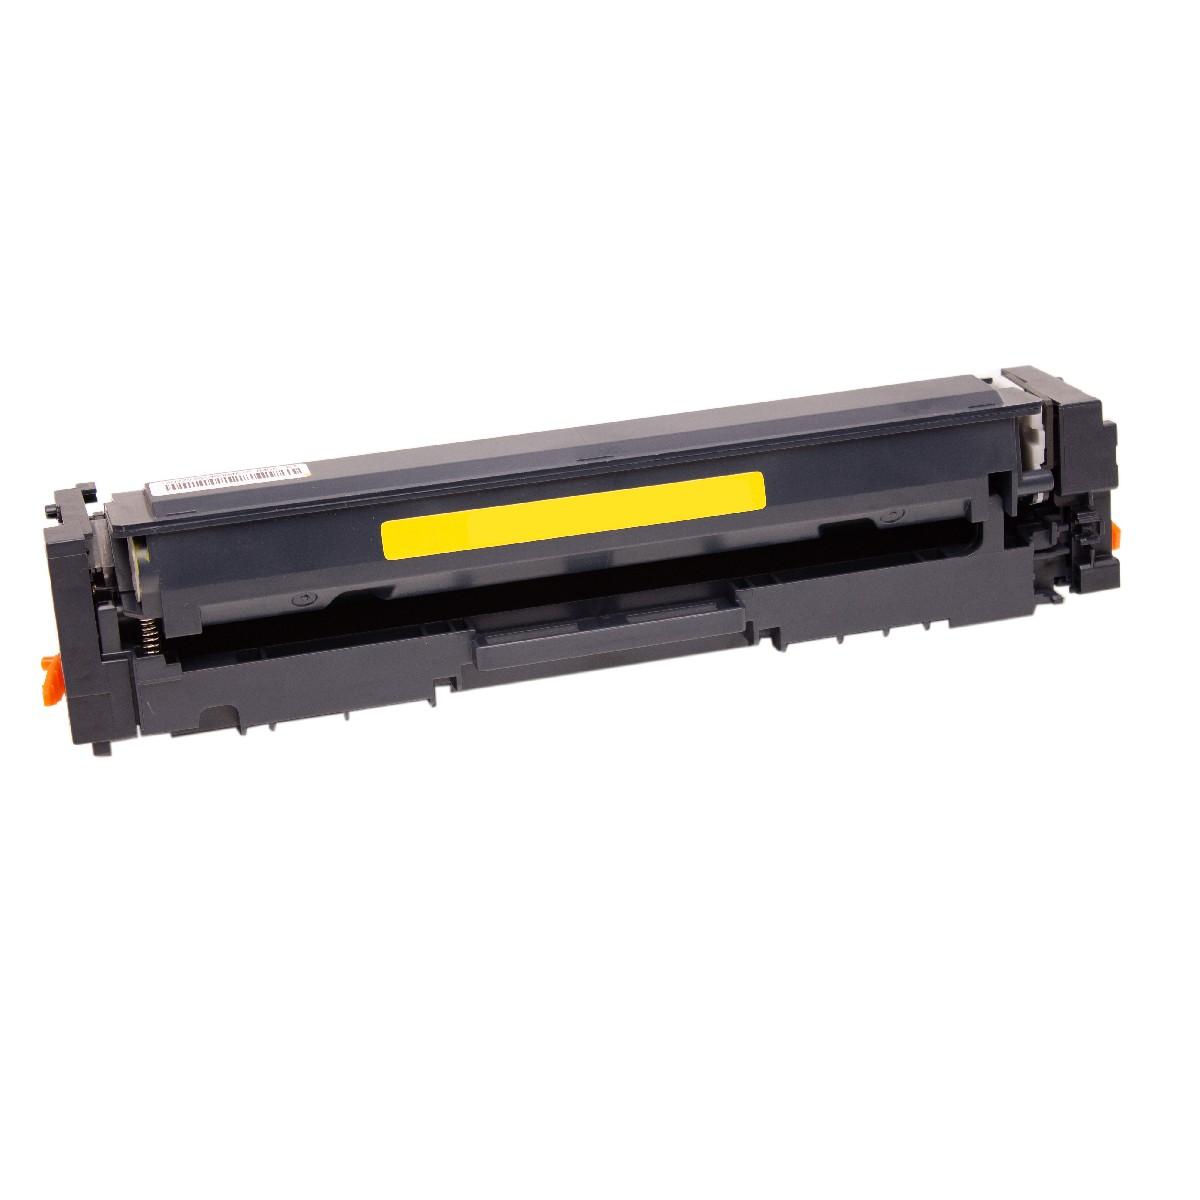 Toner HP Συμβατό 415X (W2032X) ΧΩΡΙΣ CHIP Σελίδες:6000 Yellow για Color LaserJet Enterprise, Color LaserJet Enterprise MFP